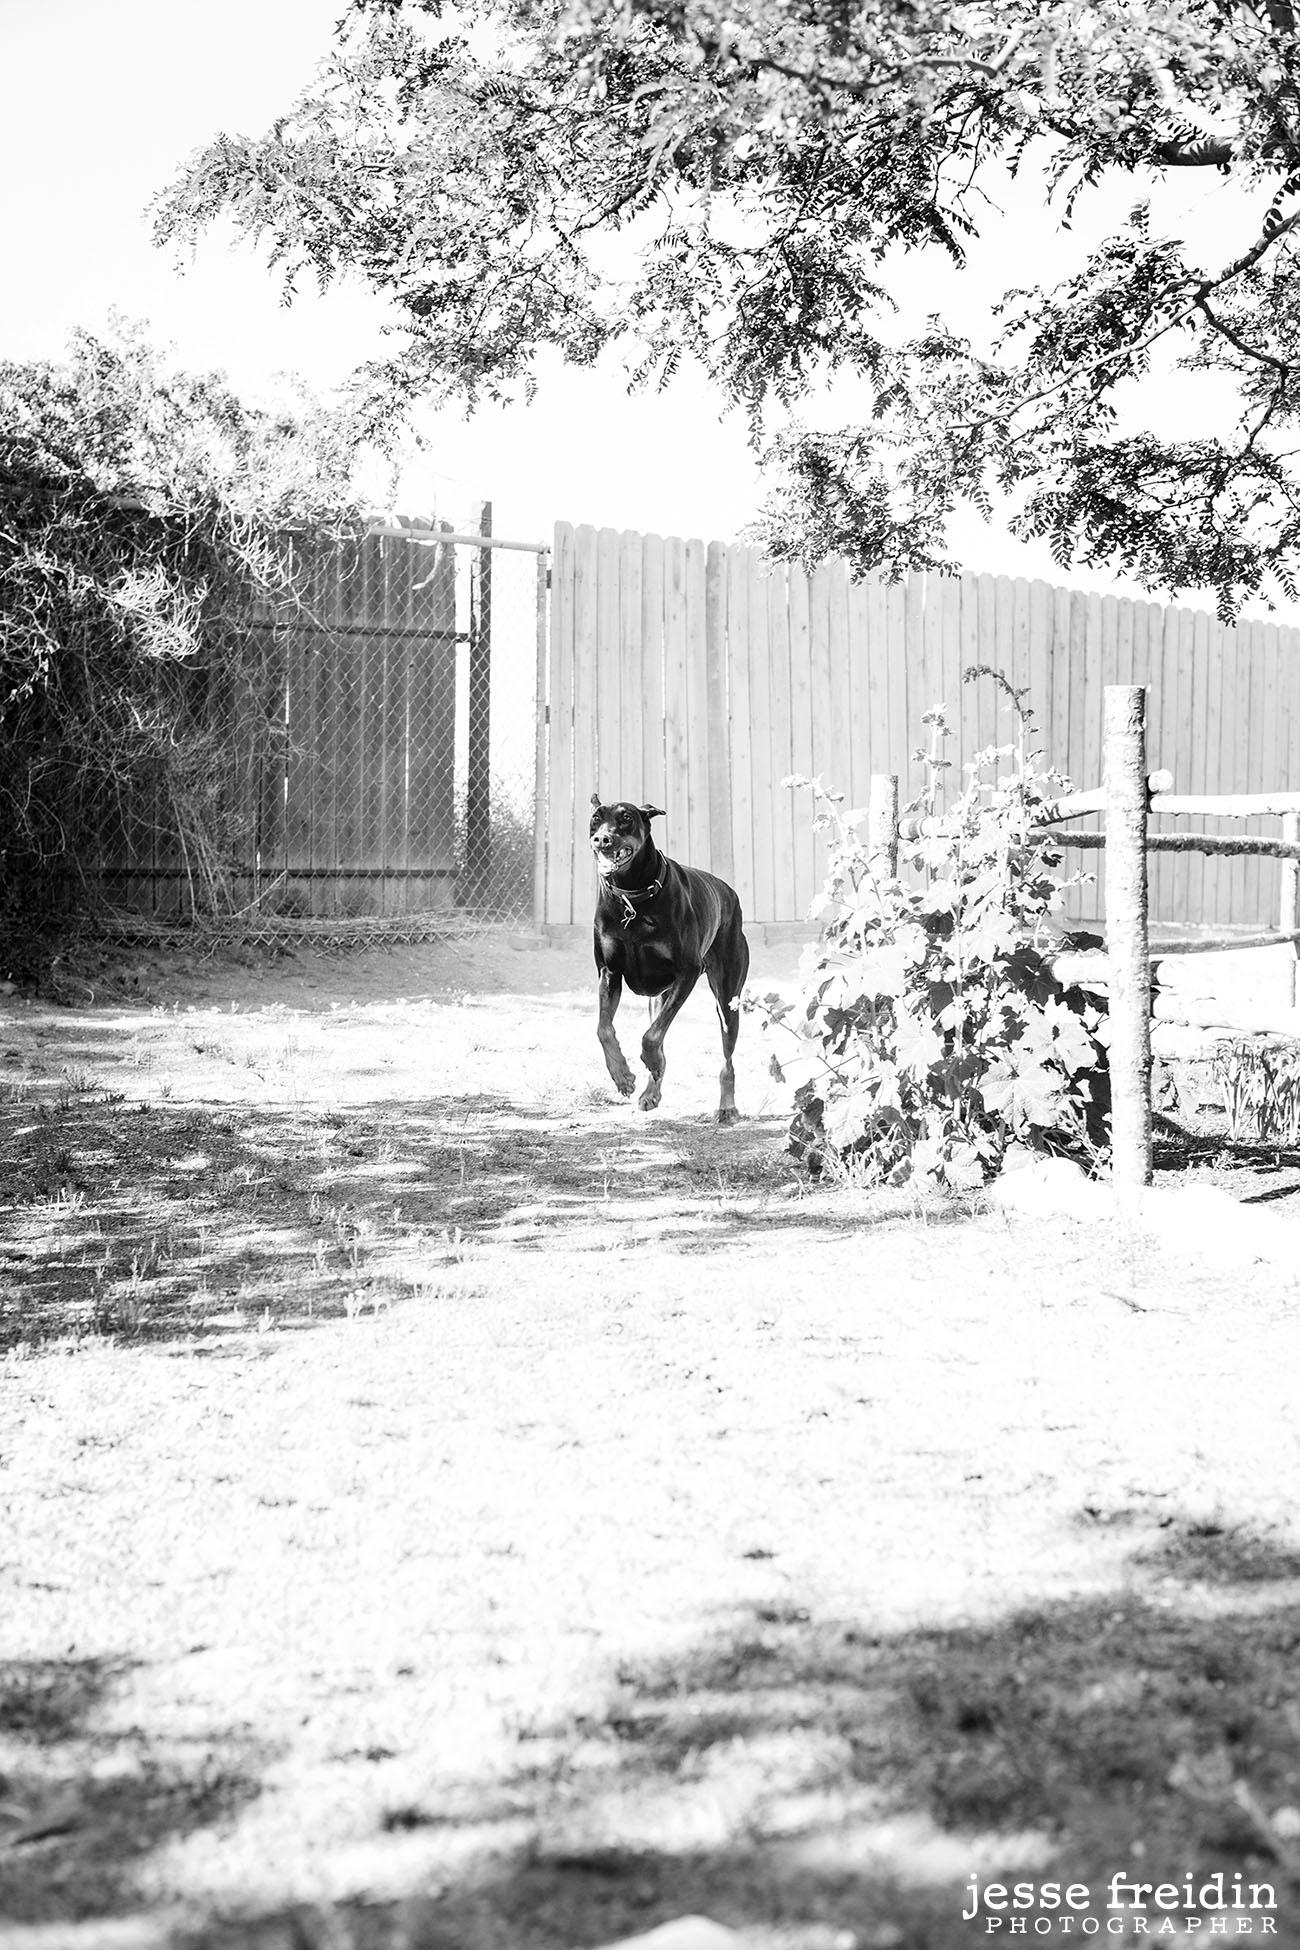 Santa Fe dog photography: Jesse Freidin